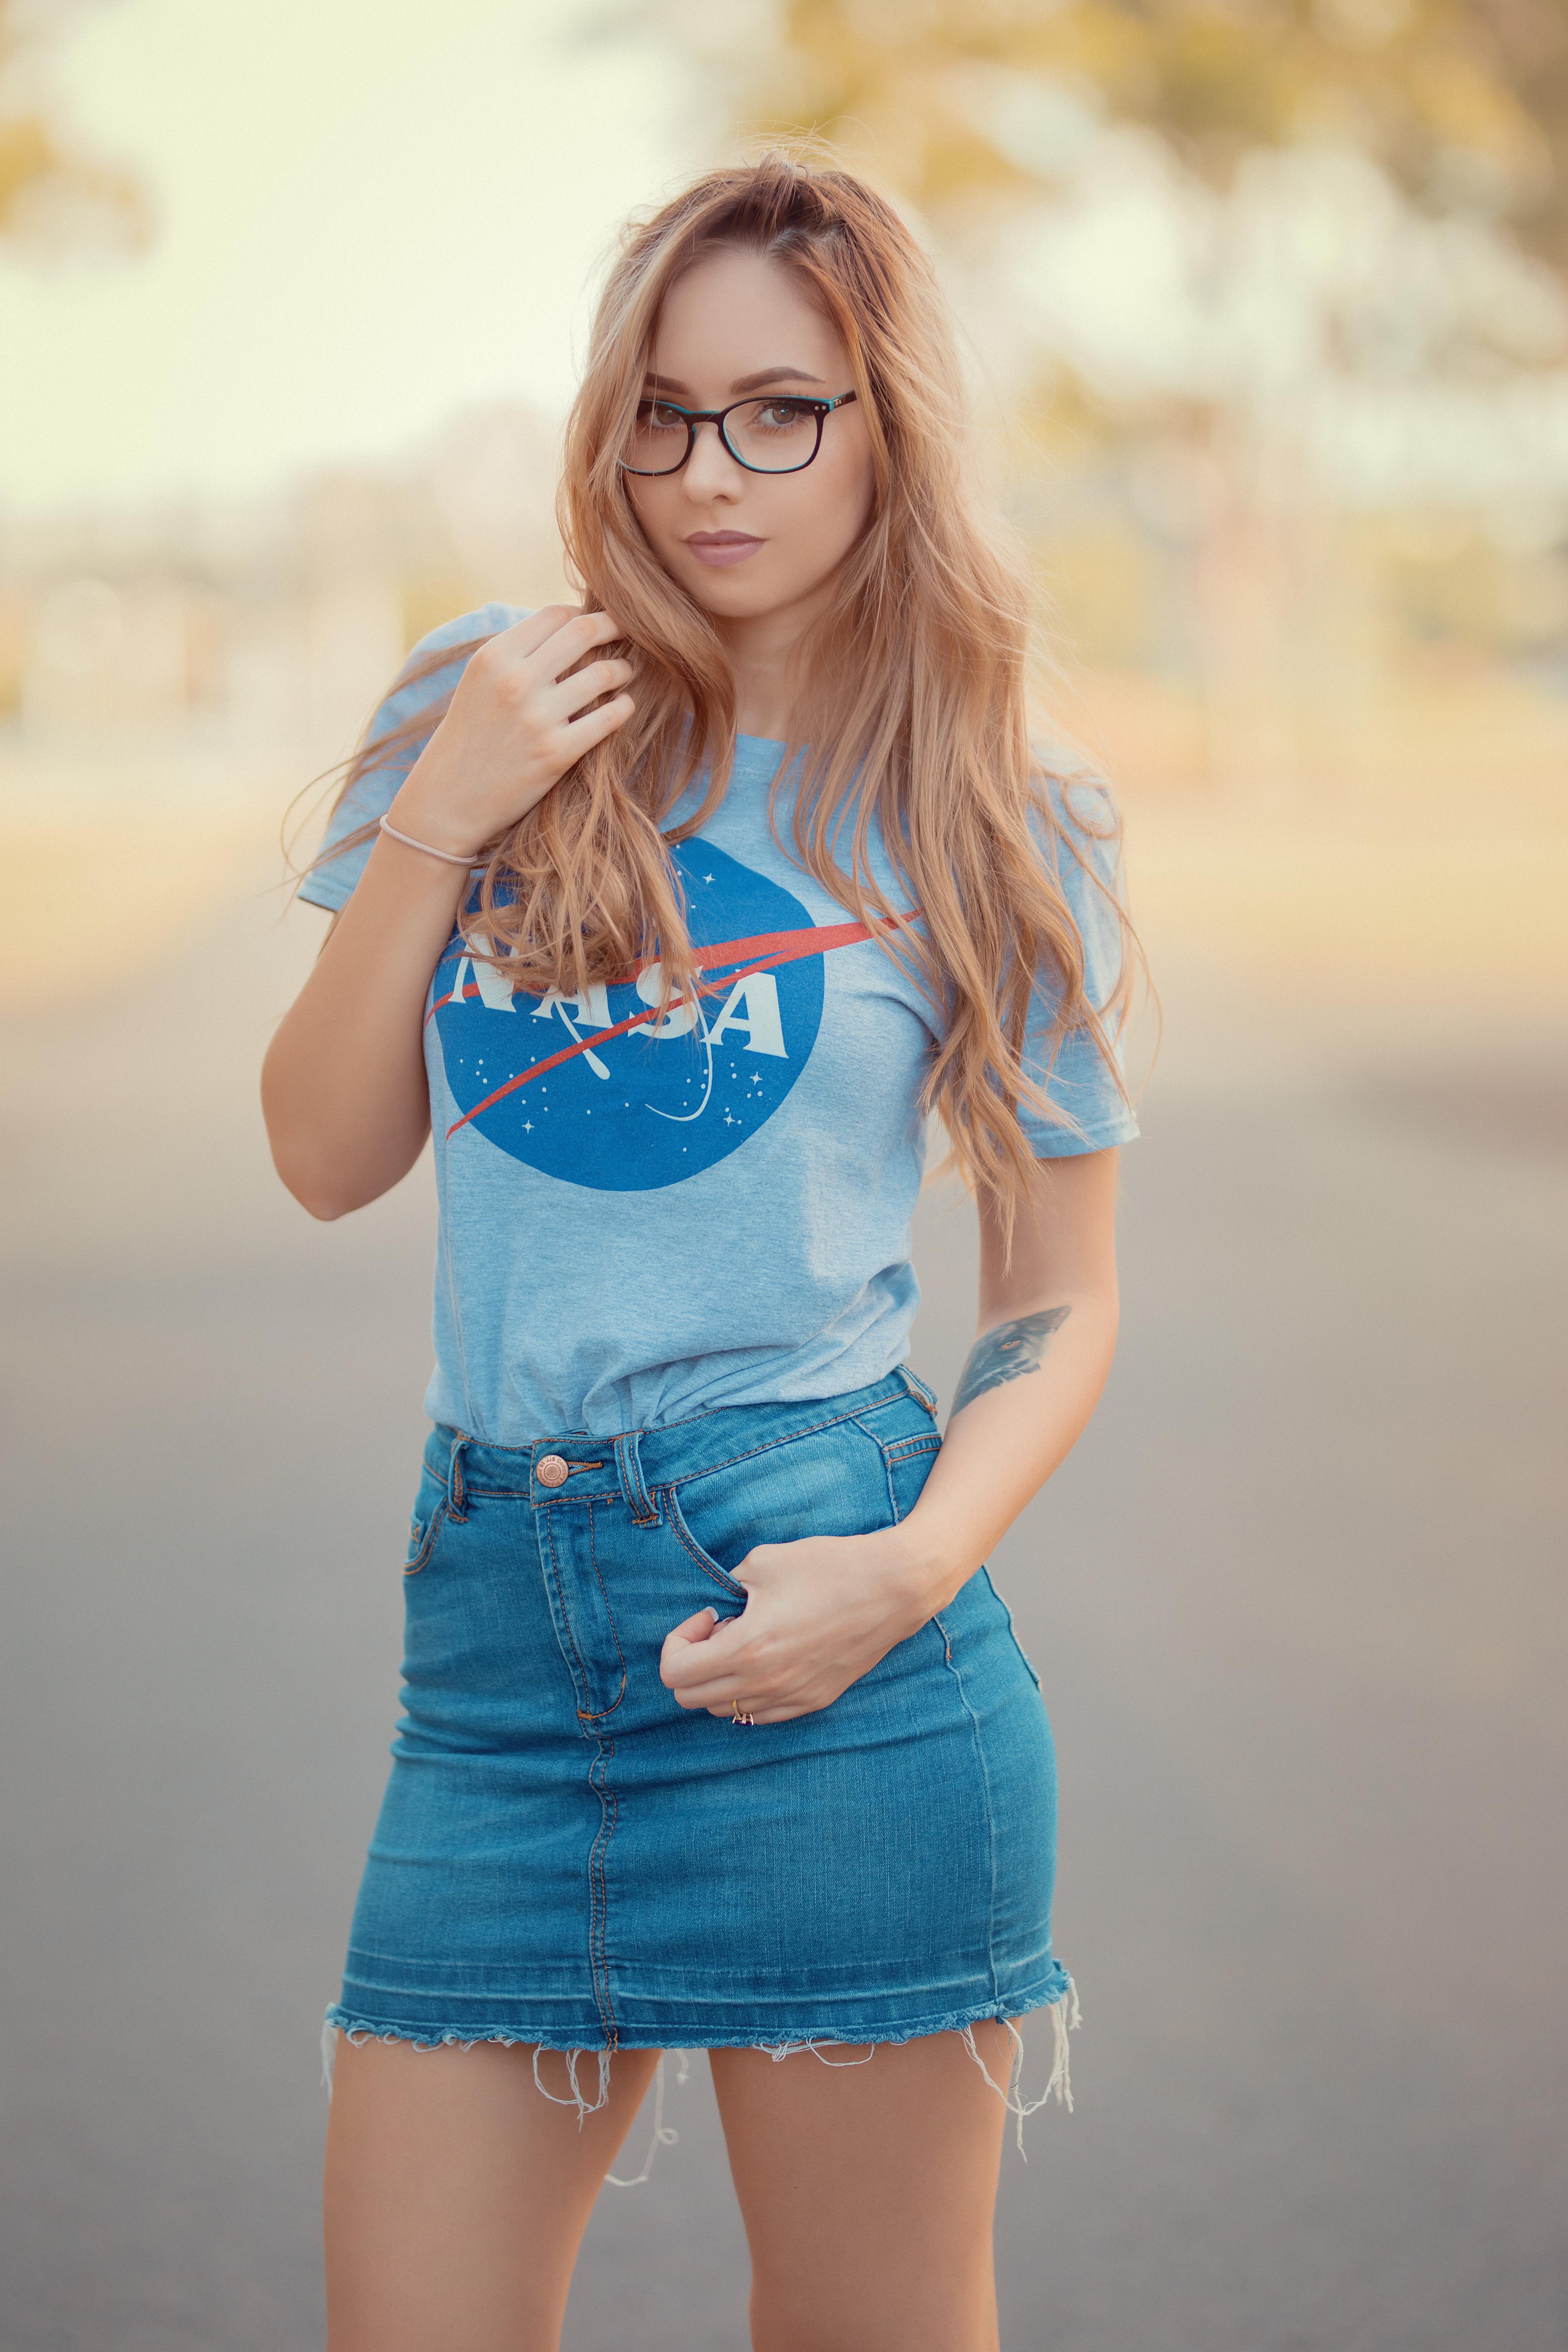 People 3546x5319 Amy Thunderbolt cosplay model redhead women NASA jean skirt